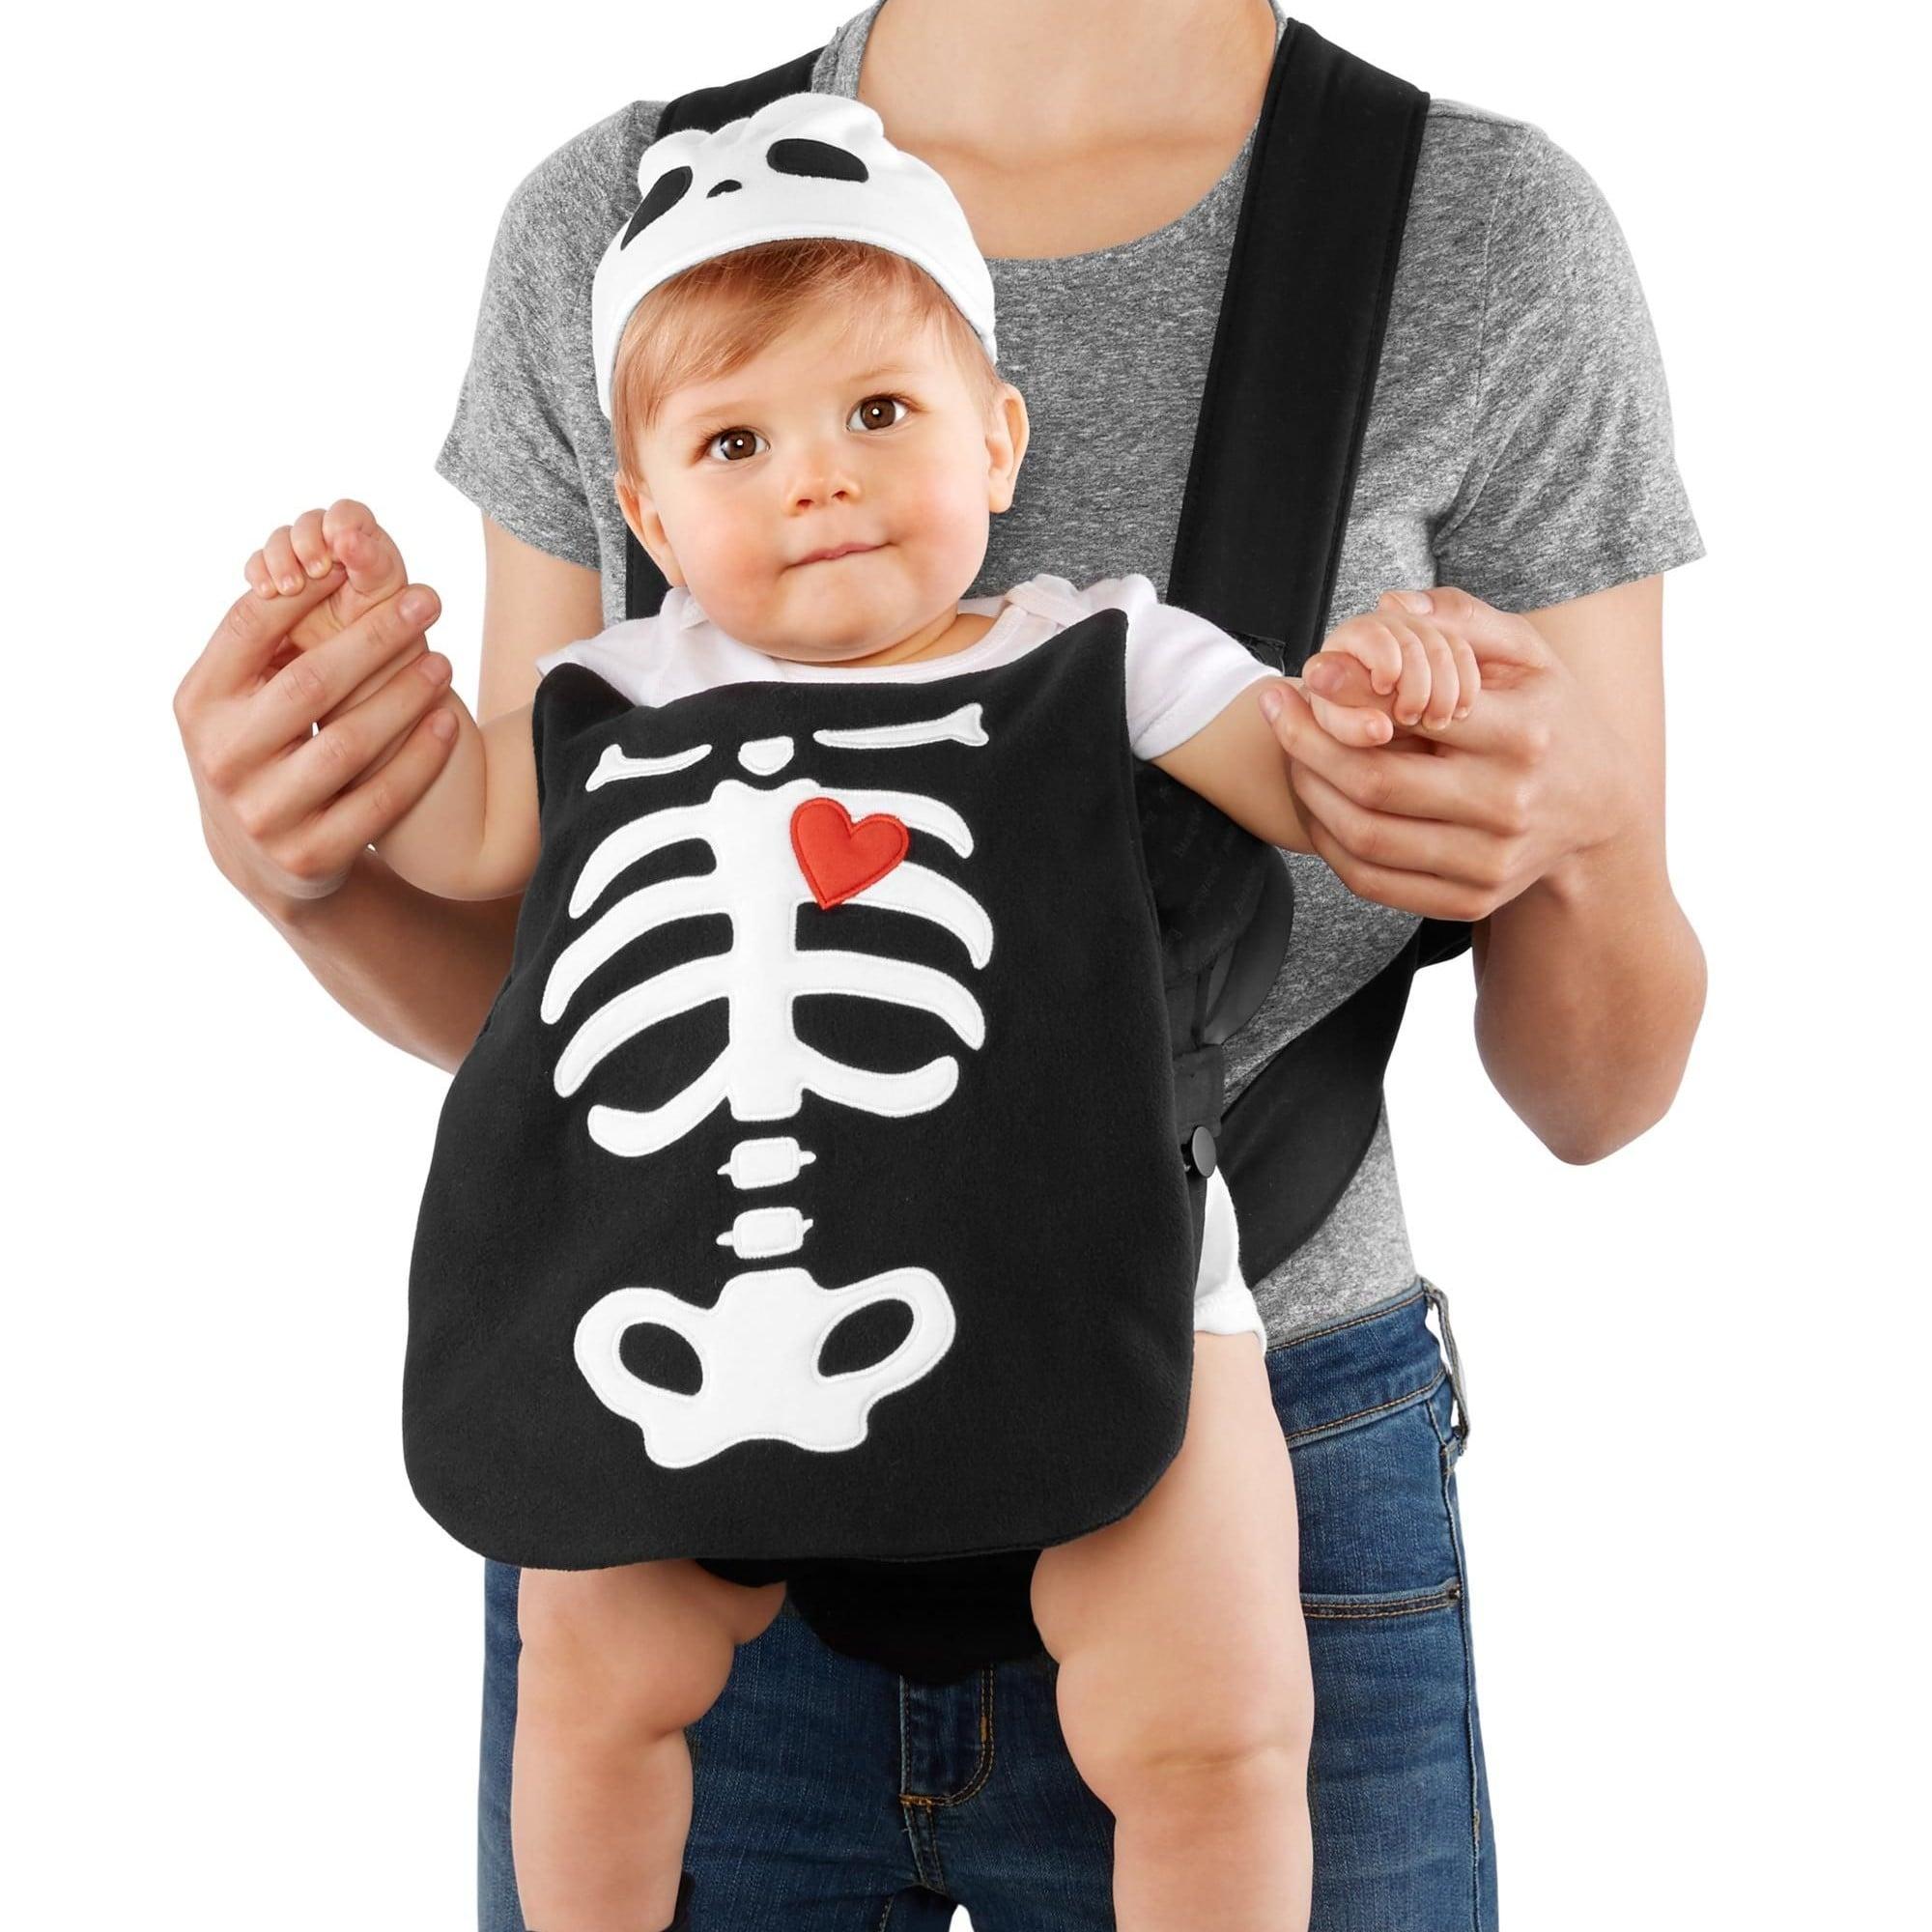 carters little skeleton halloween carrier costume carters baby carrier halloween costumes popsugar moms photo 4